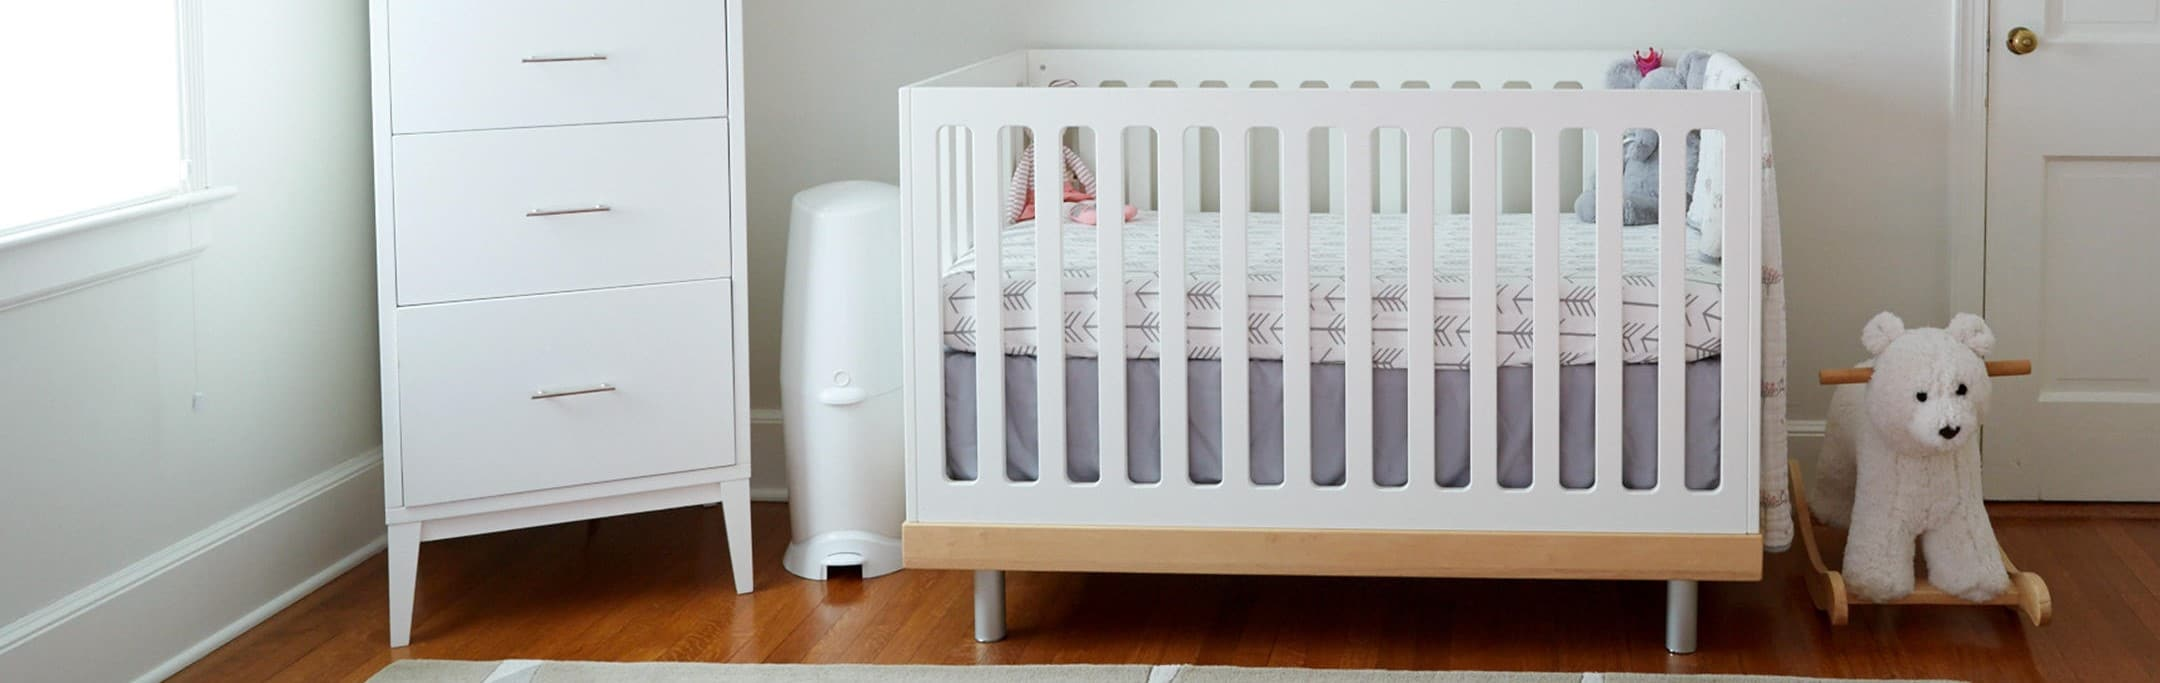 Best Crib Mattresses Reviewed in Detail